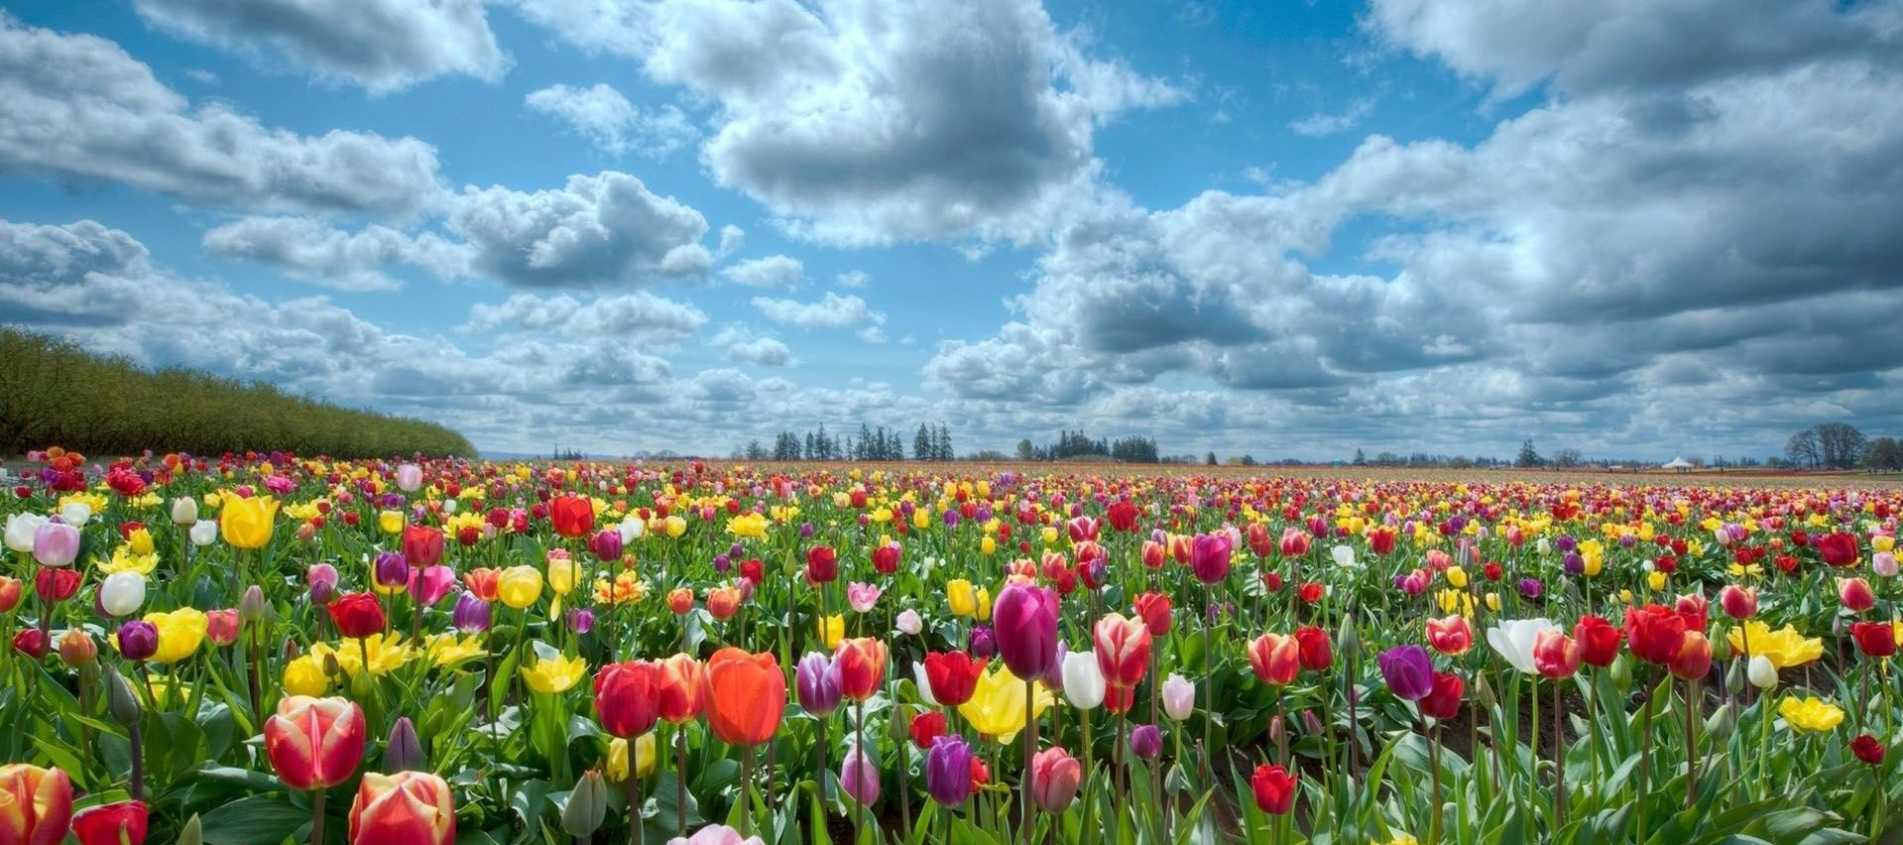 Flower Fields For Family Photos